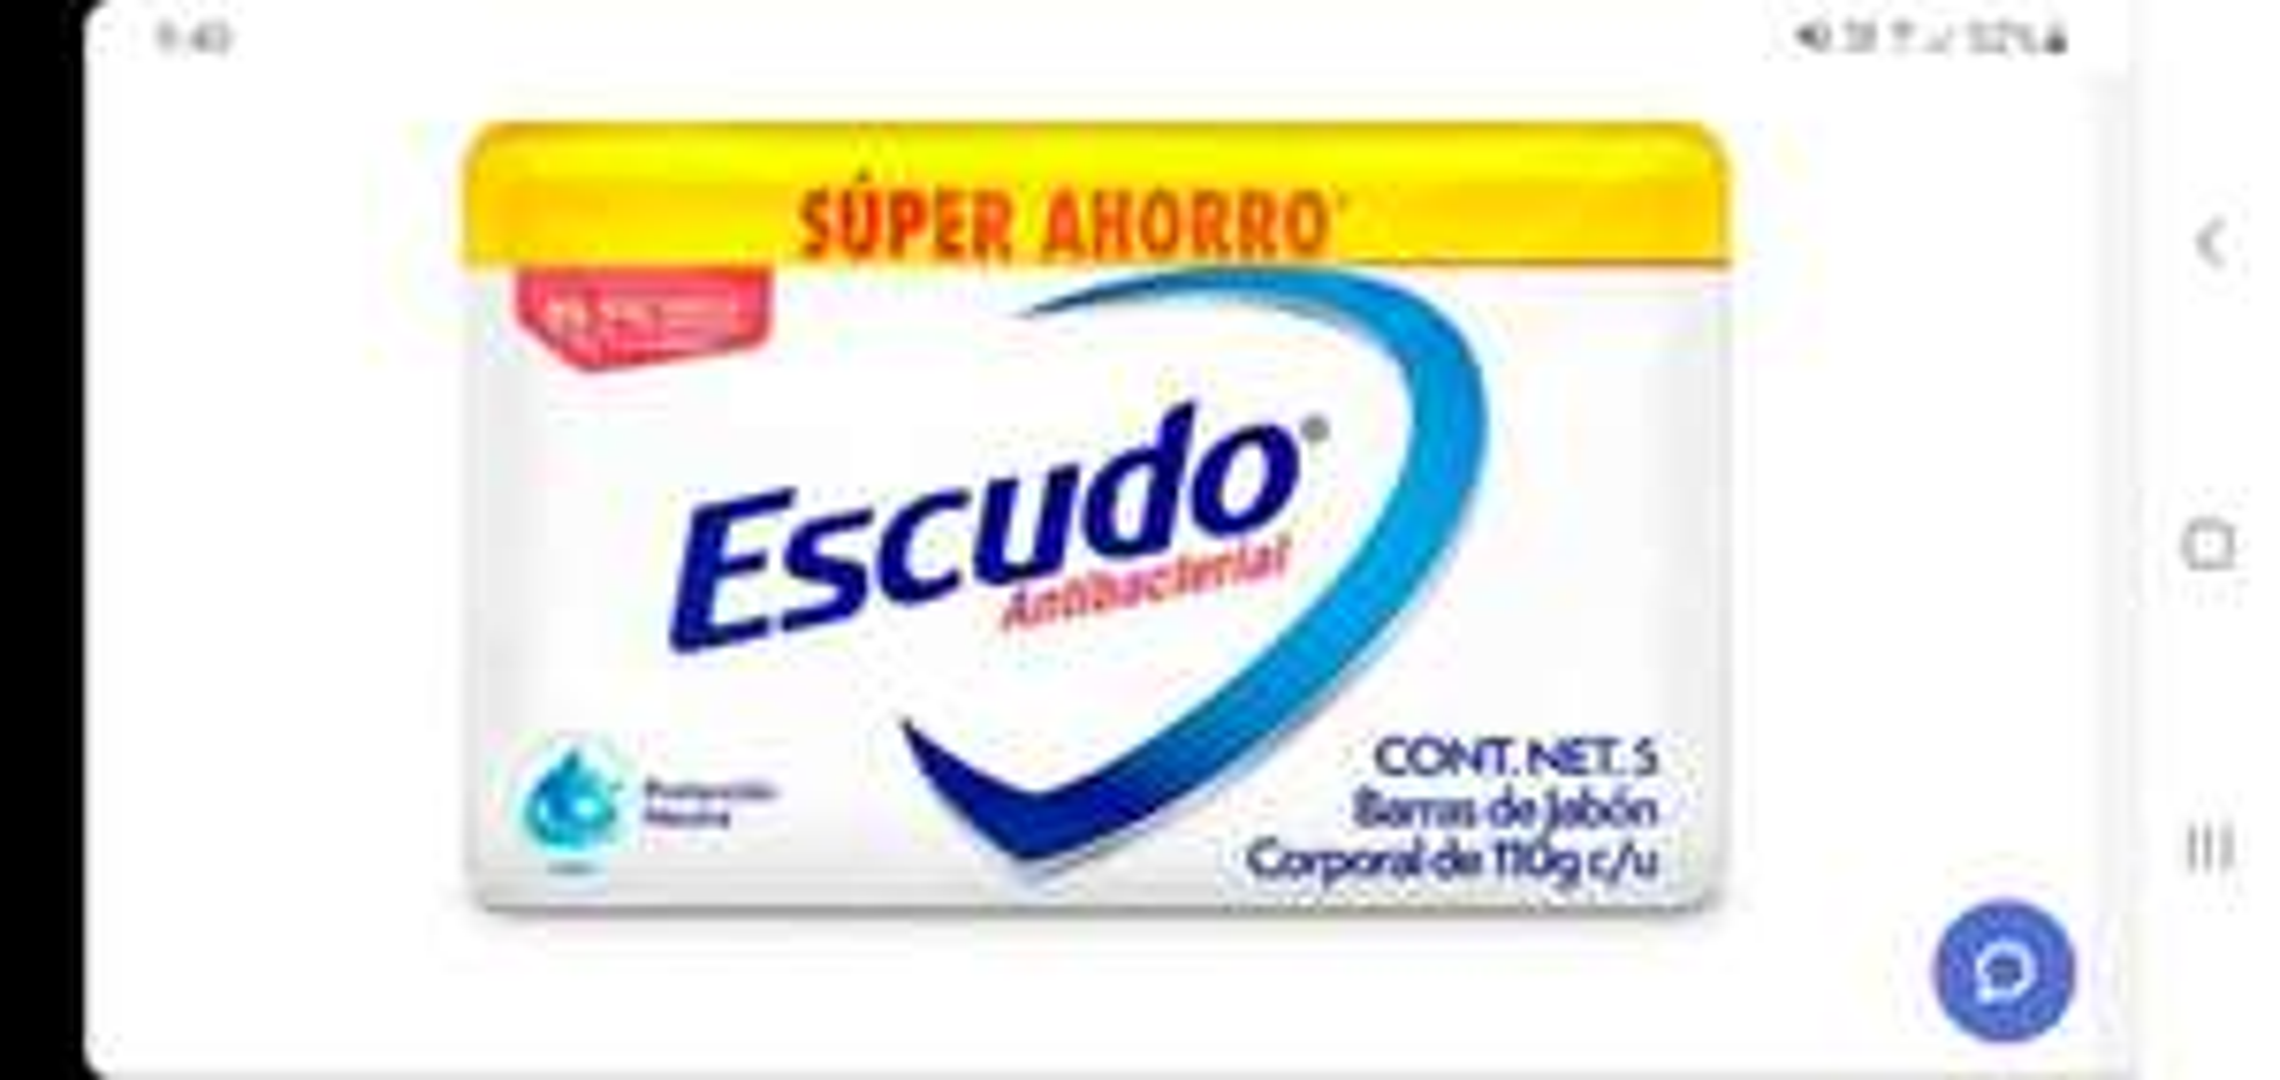 CHEDRAUI ESCUDO NEUTRO ANTIBACTERIAL 5 BARRAS 110G C/U